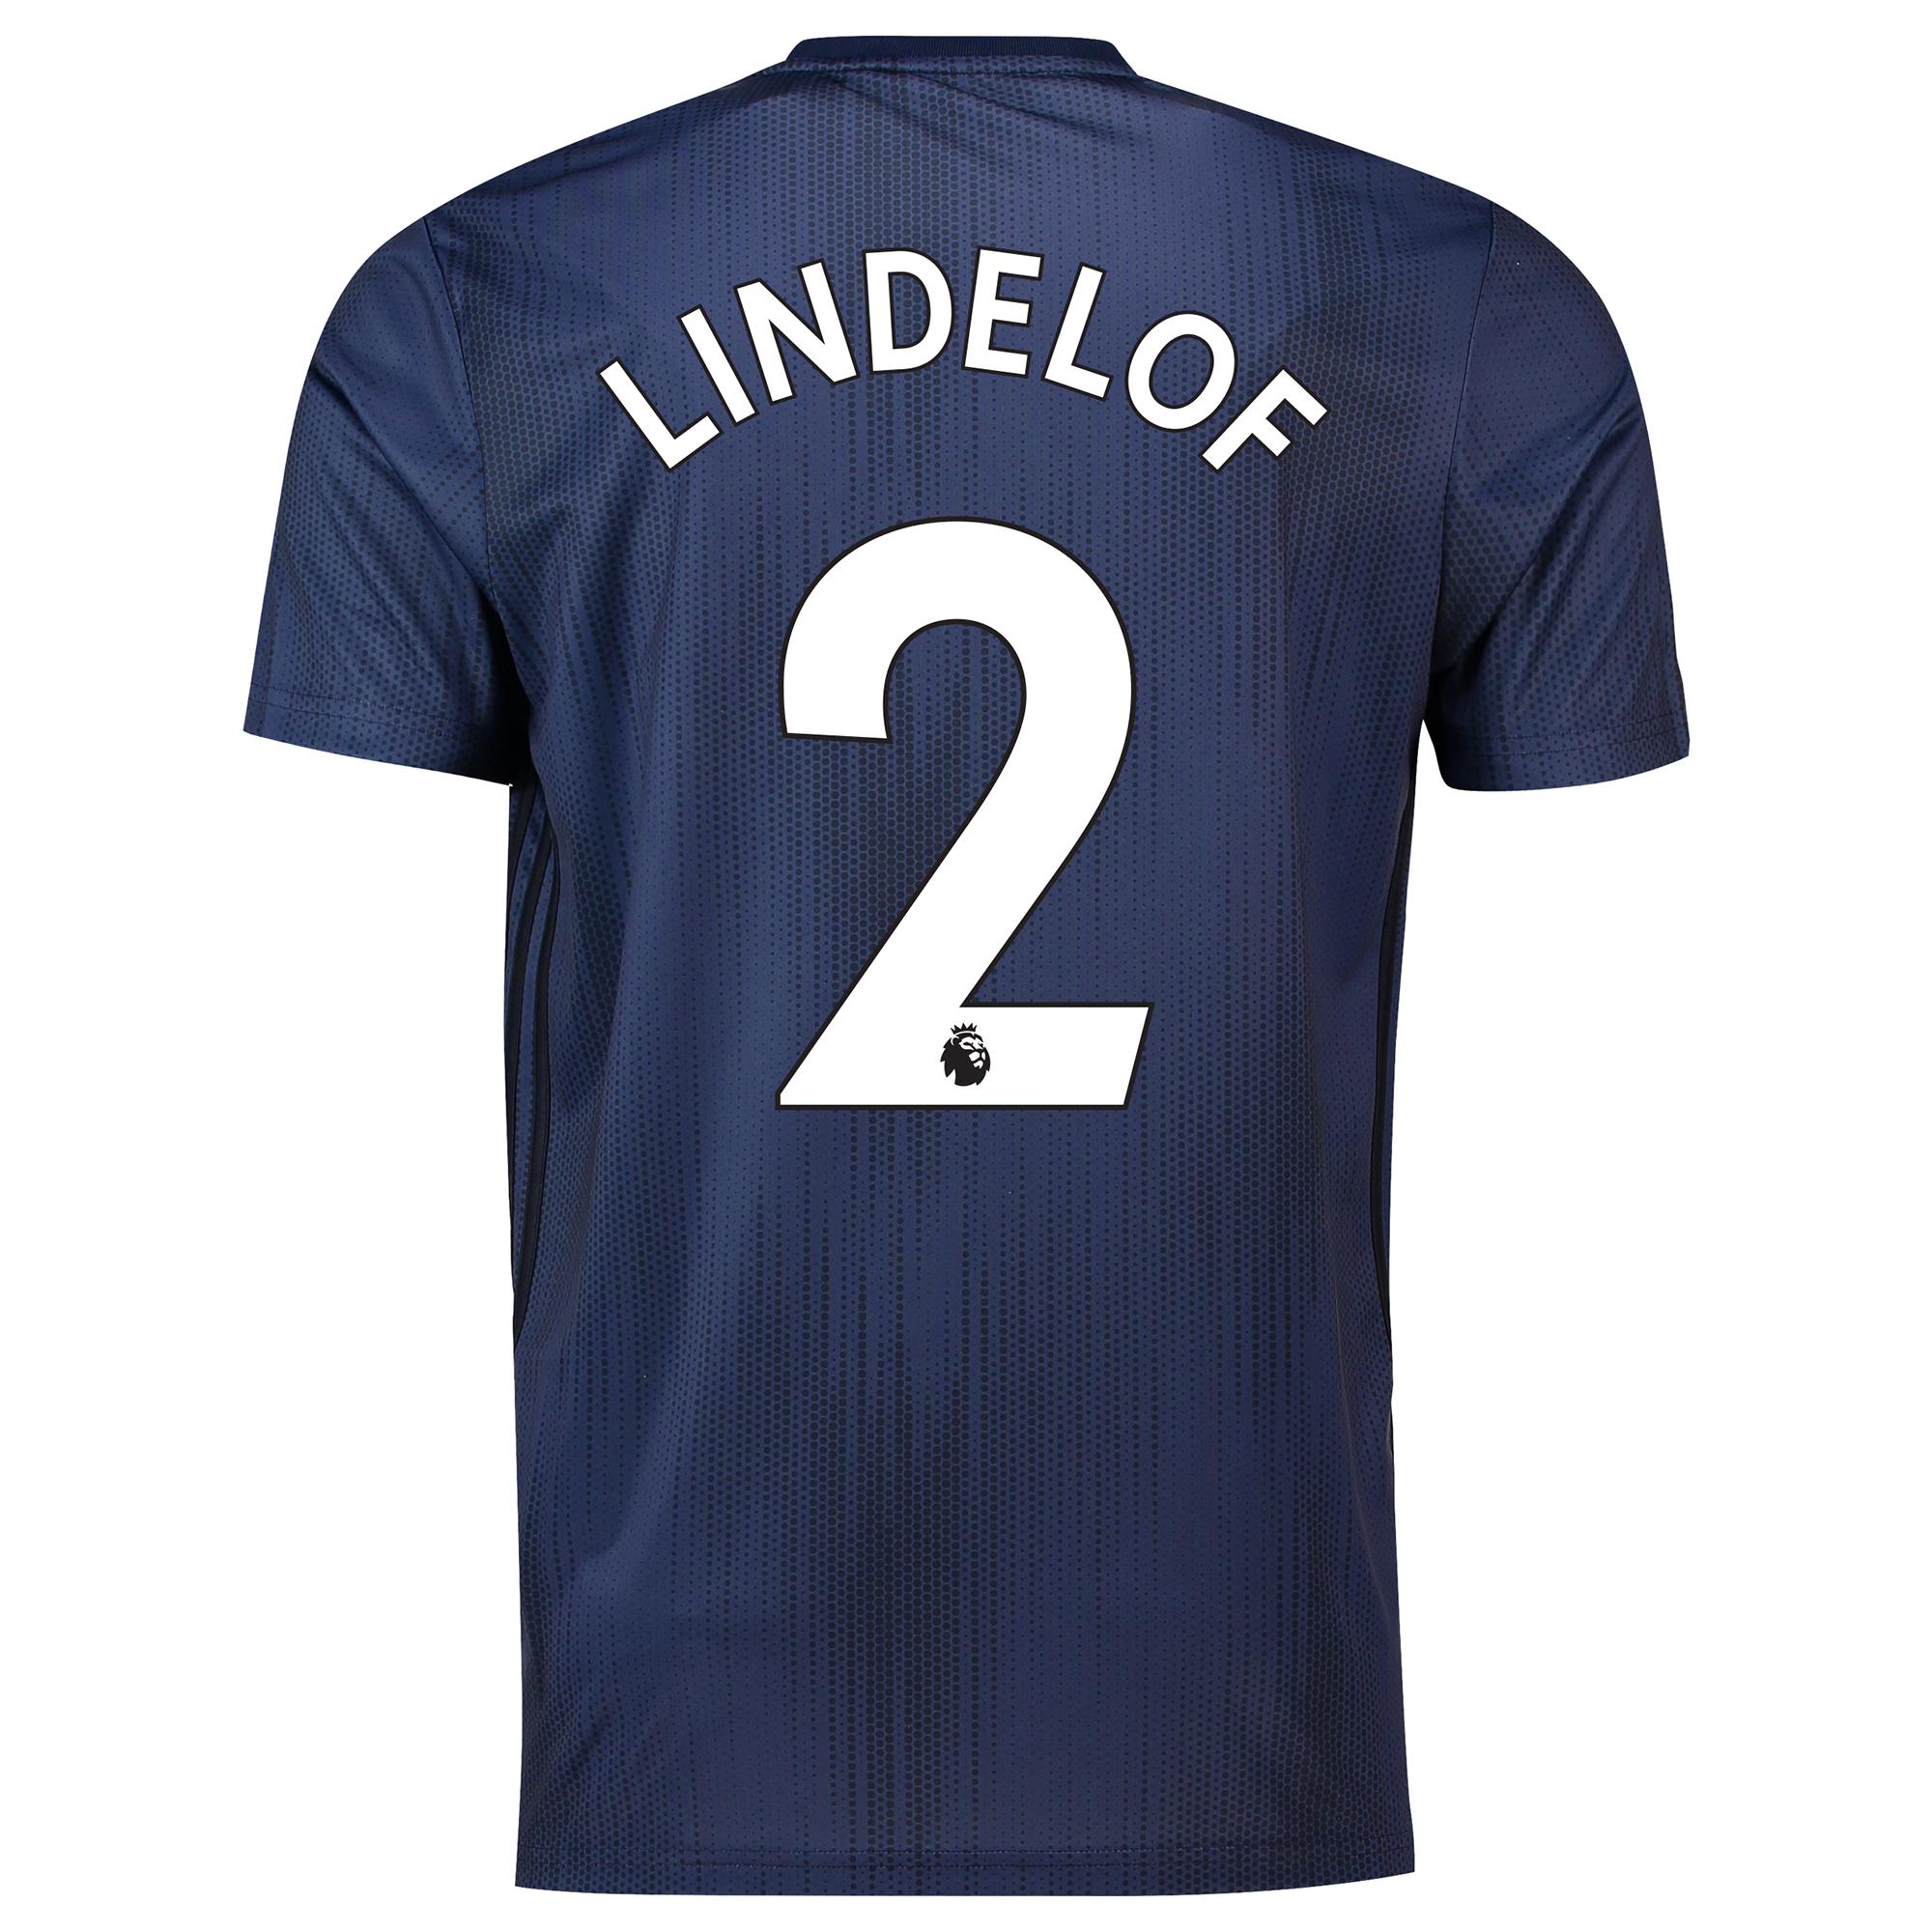 Camiseta de la tercera equipación del Manchester United 2018-19 dorsal Lindelof 2